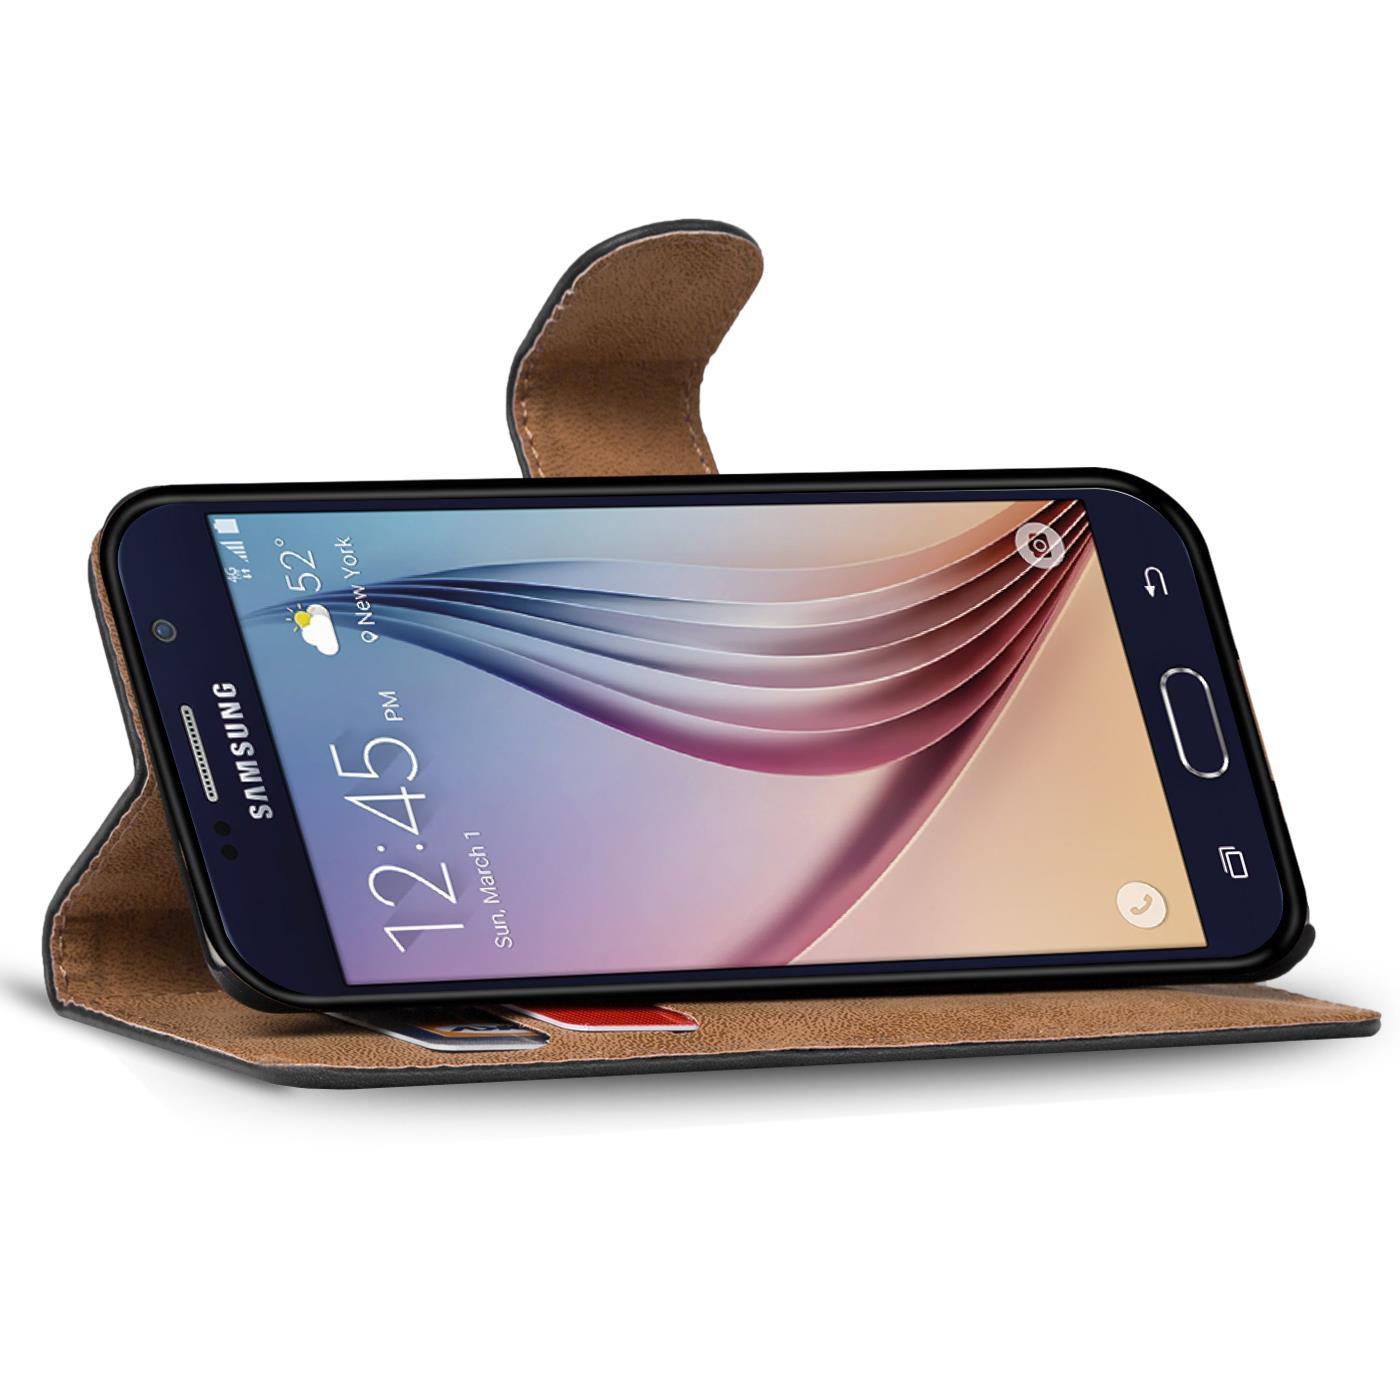 Book-Case-Samsung-Galaxy-s6-edge-Plus-Sac-etui-Flip-Cover-pour-Telephone-Portable-etui-Noir miniature 3